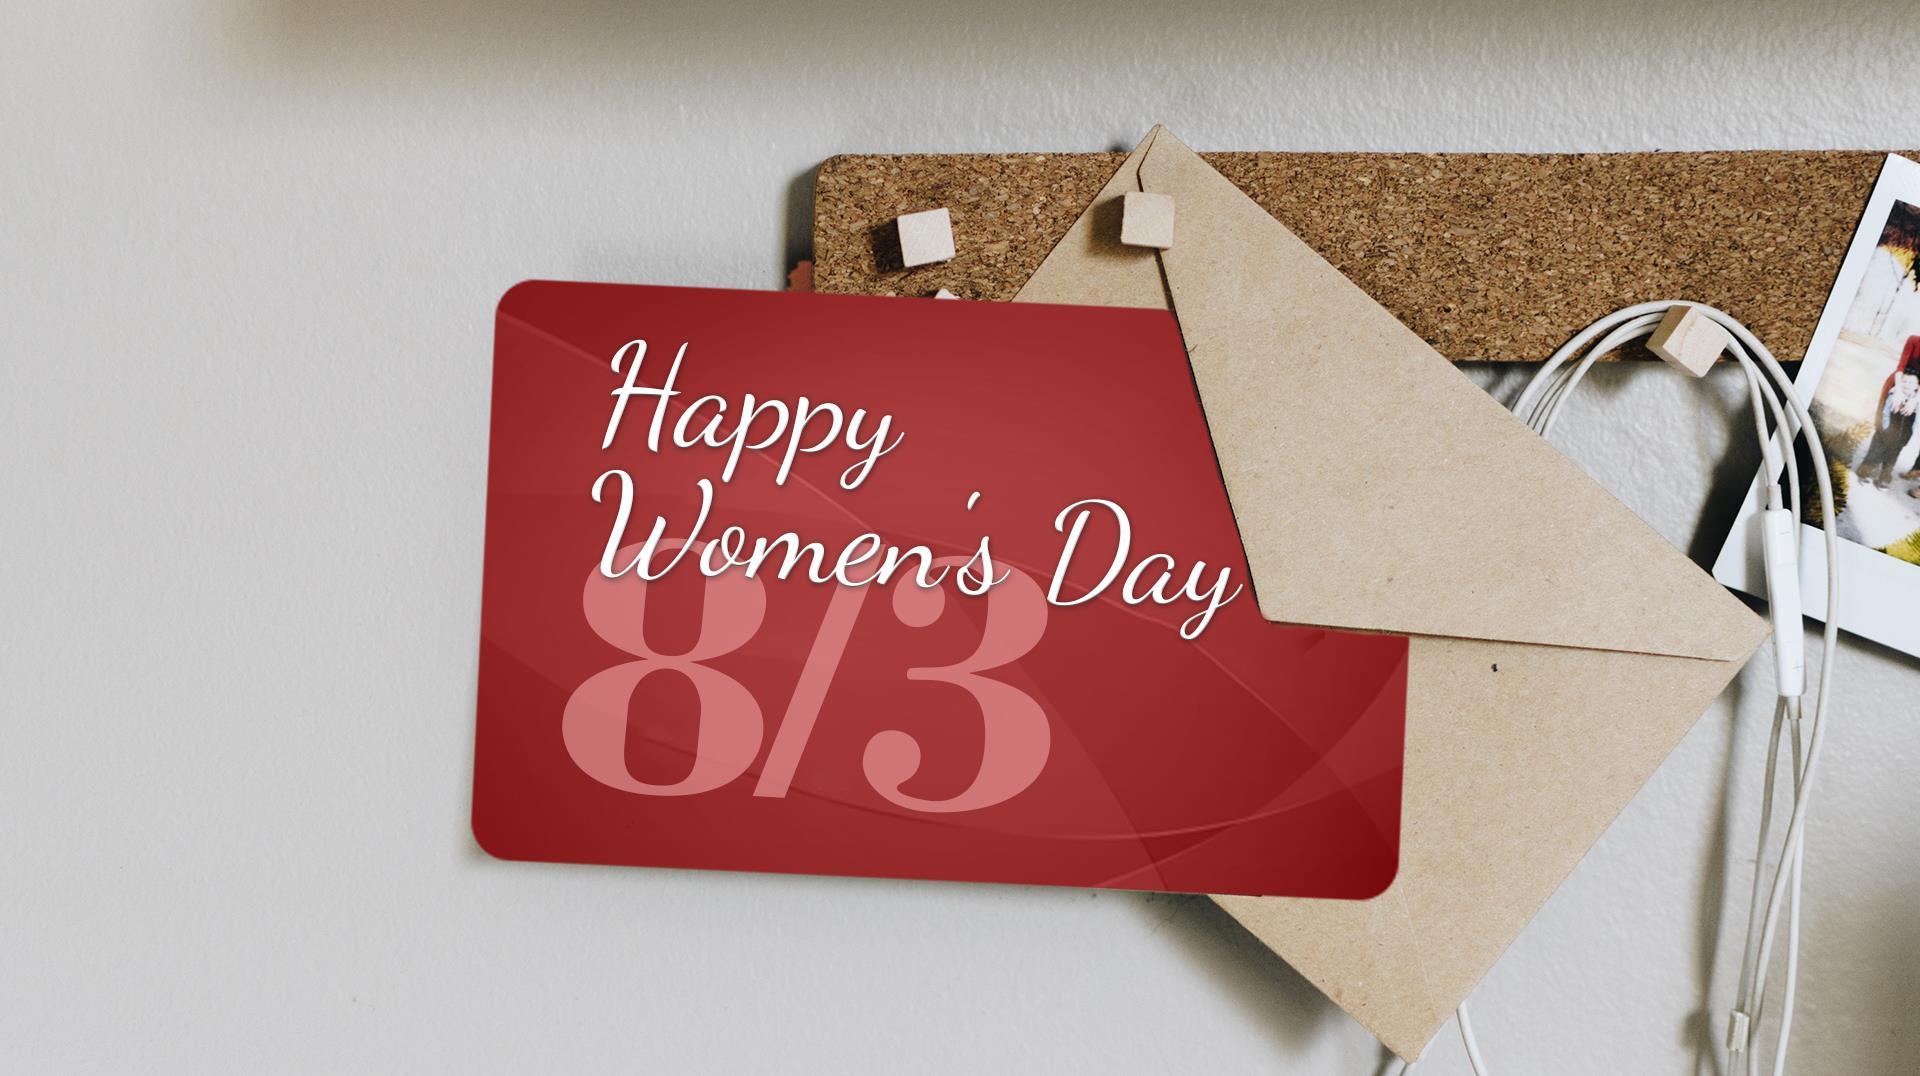 International Women's Day Sales Tips